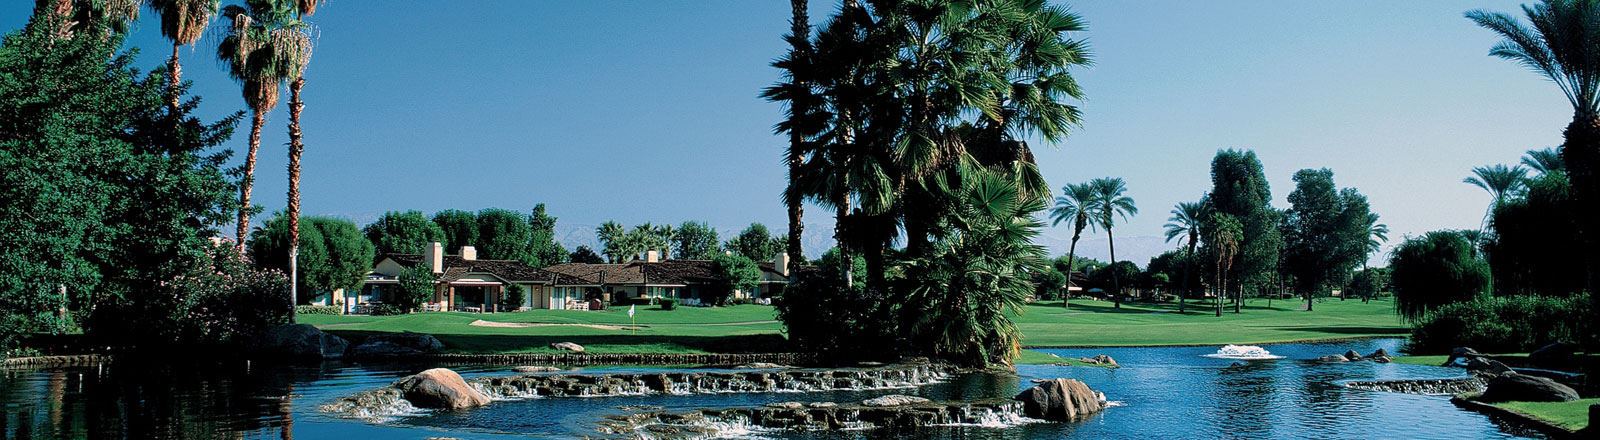 California - Palm Springs Header